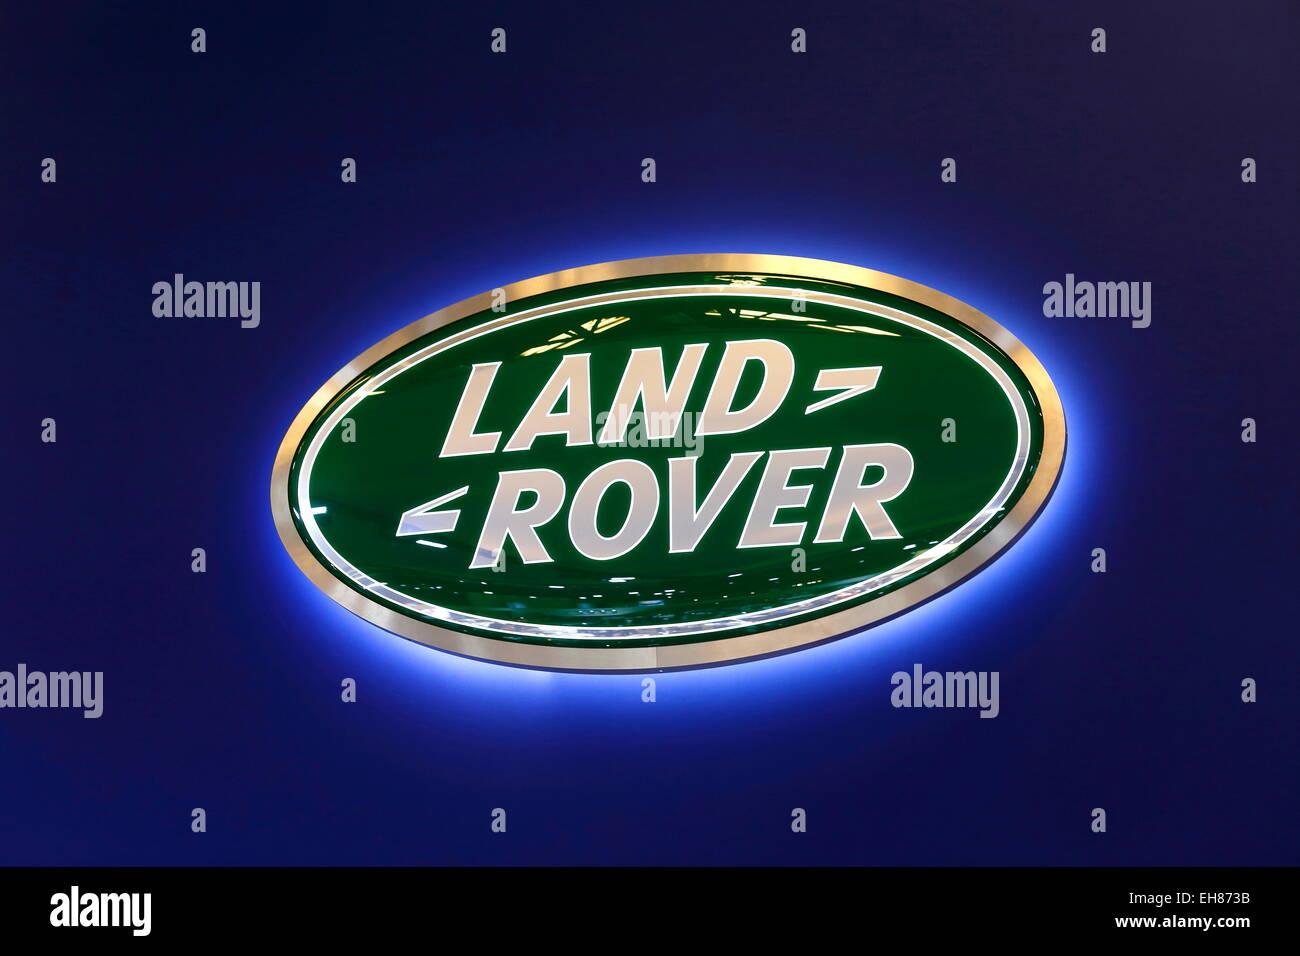 Land Rover company logo, Salon de l'Automobile, Montreal, Quebec Province, Canada - Stock Image